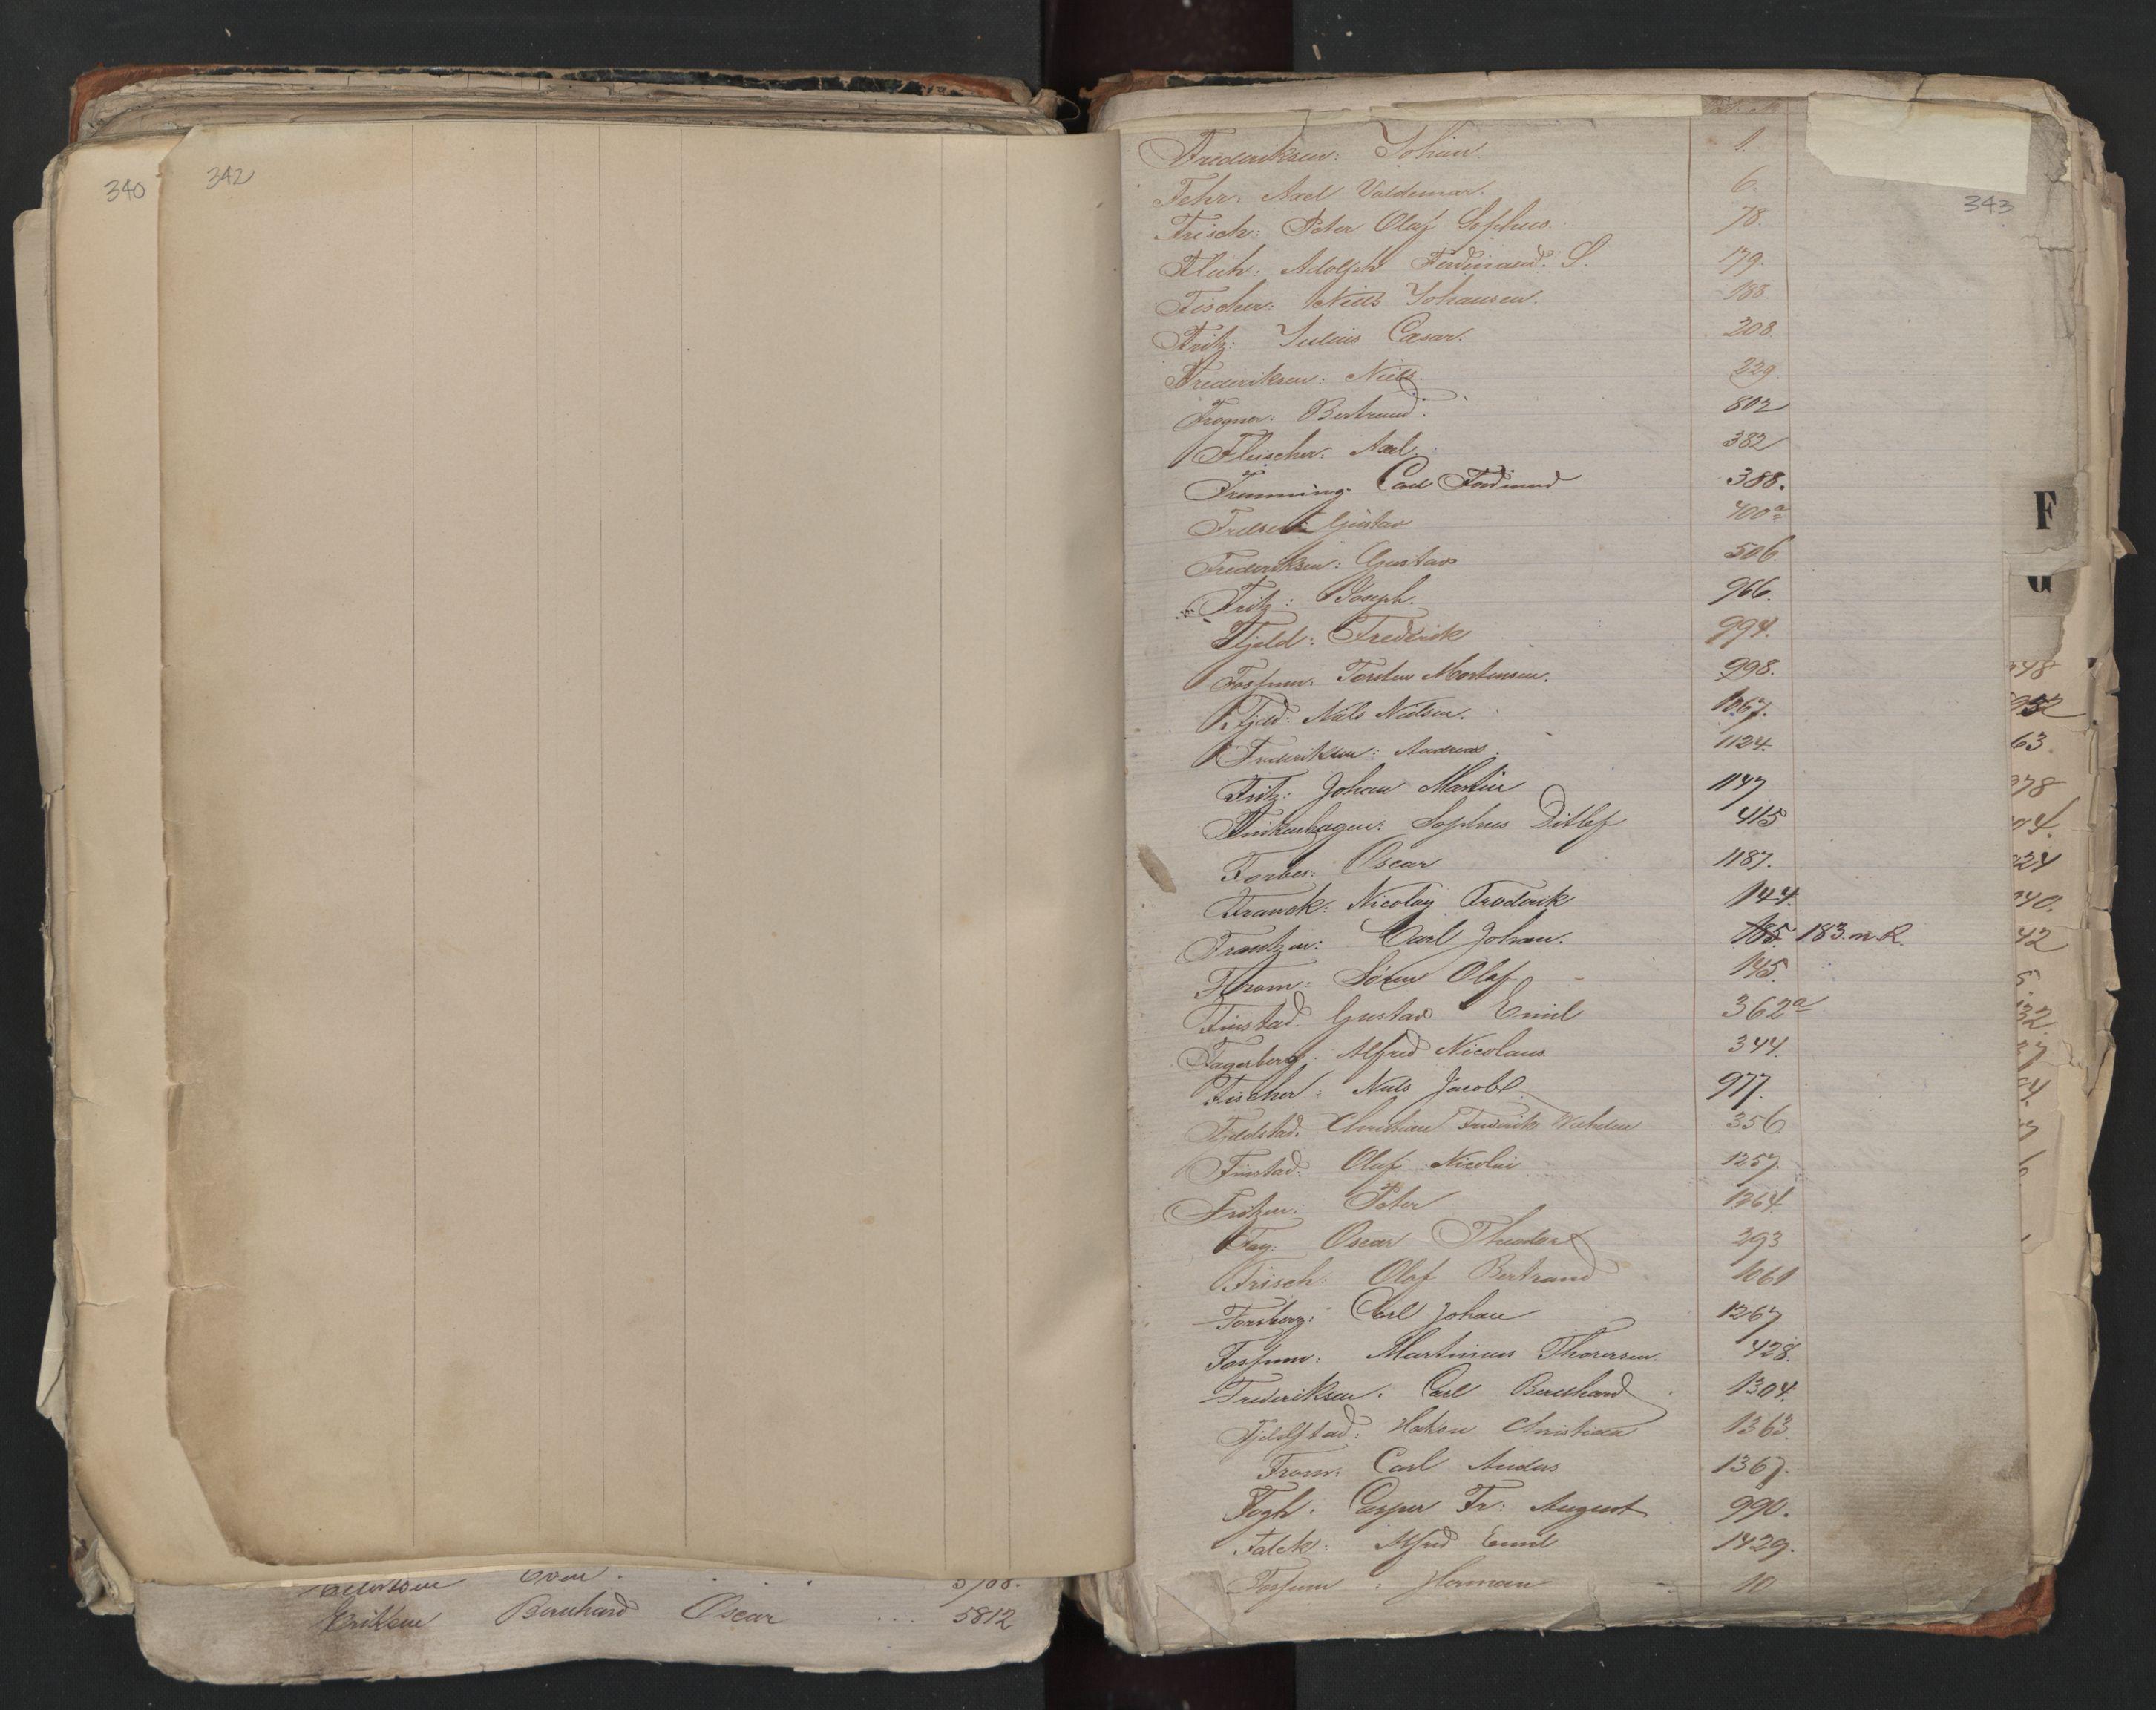 SAO, Oslo sjømannskontor, F/Fa/L0001: Register for Kristiania krets, 1866-1891, s. 342-343